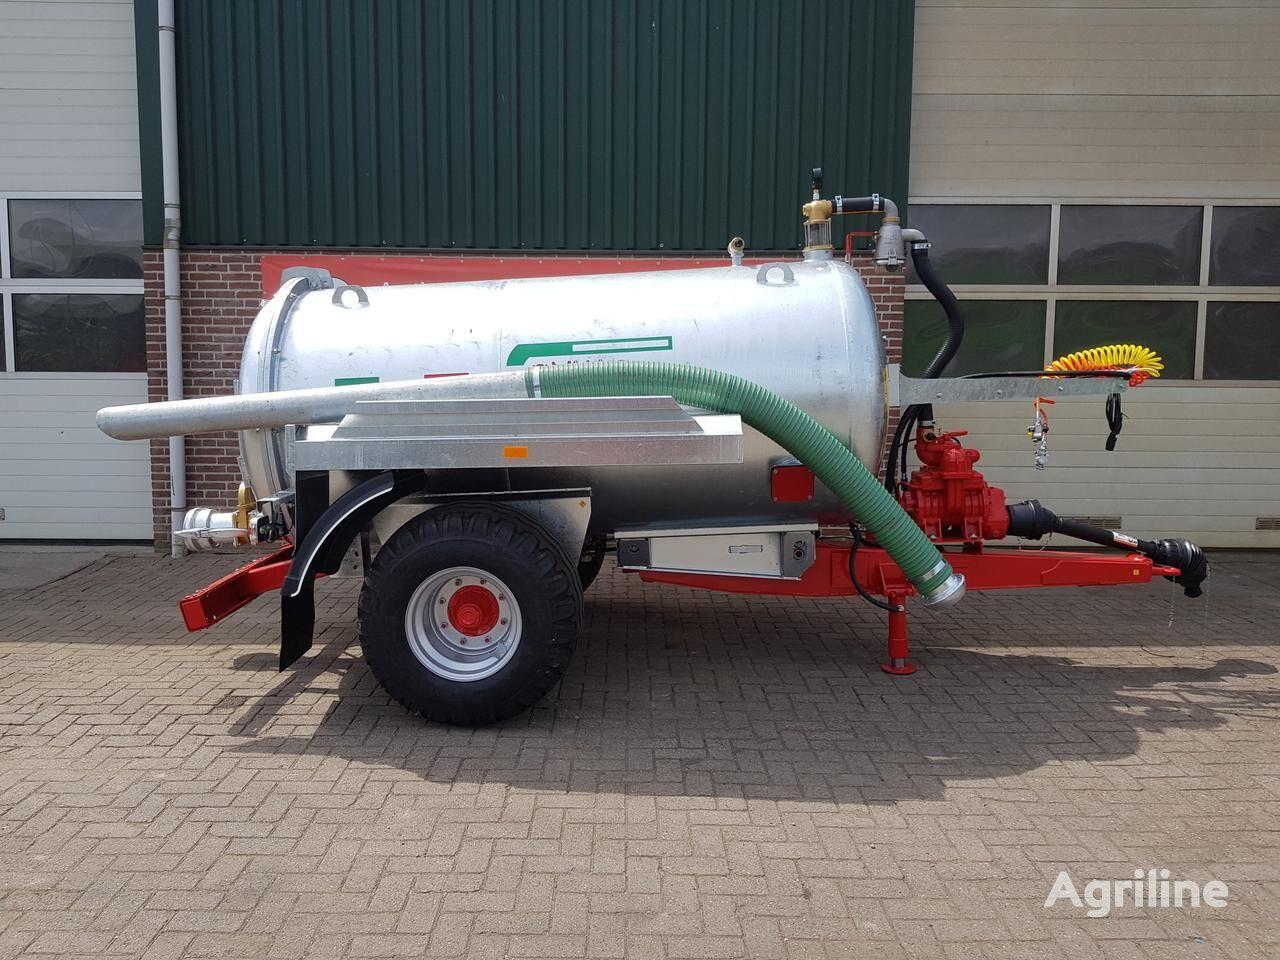 VAIA MB 35 watertank liquid manure spreader